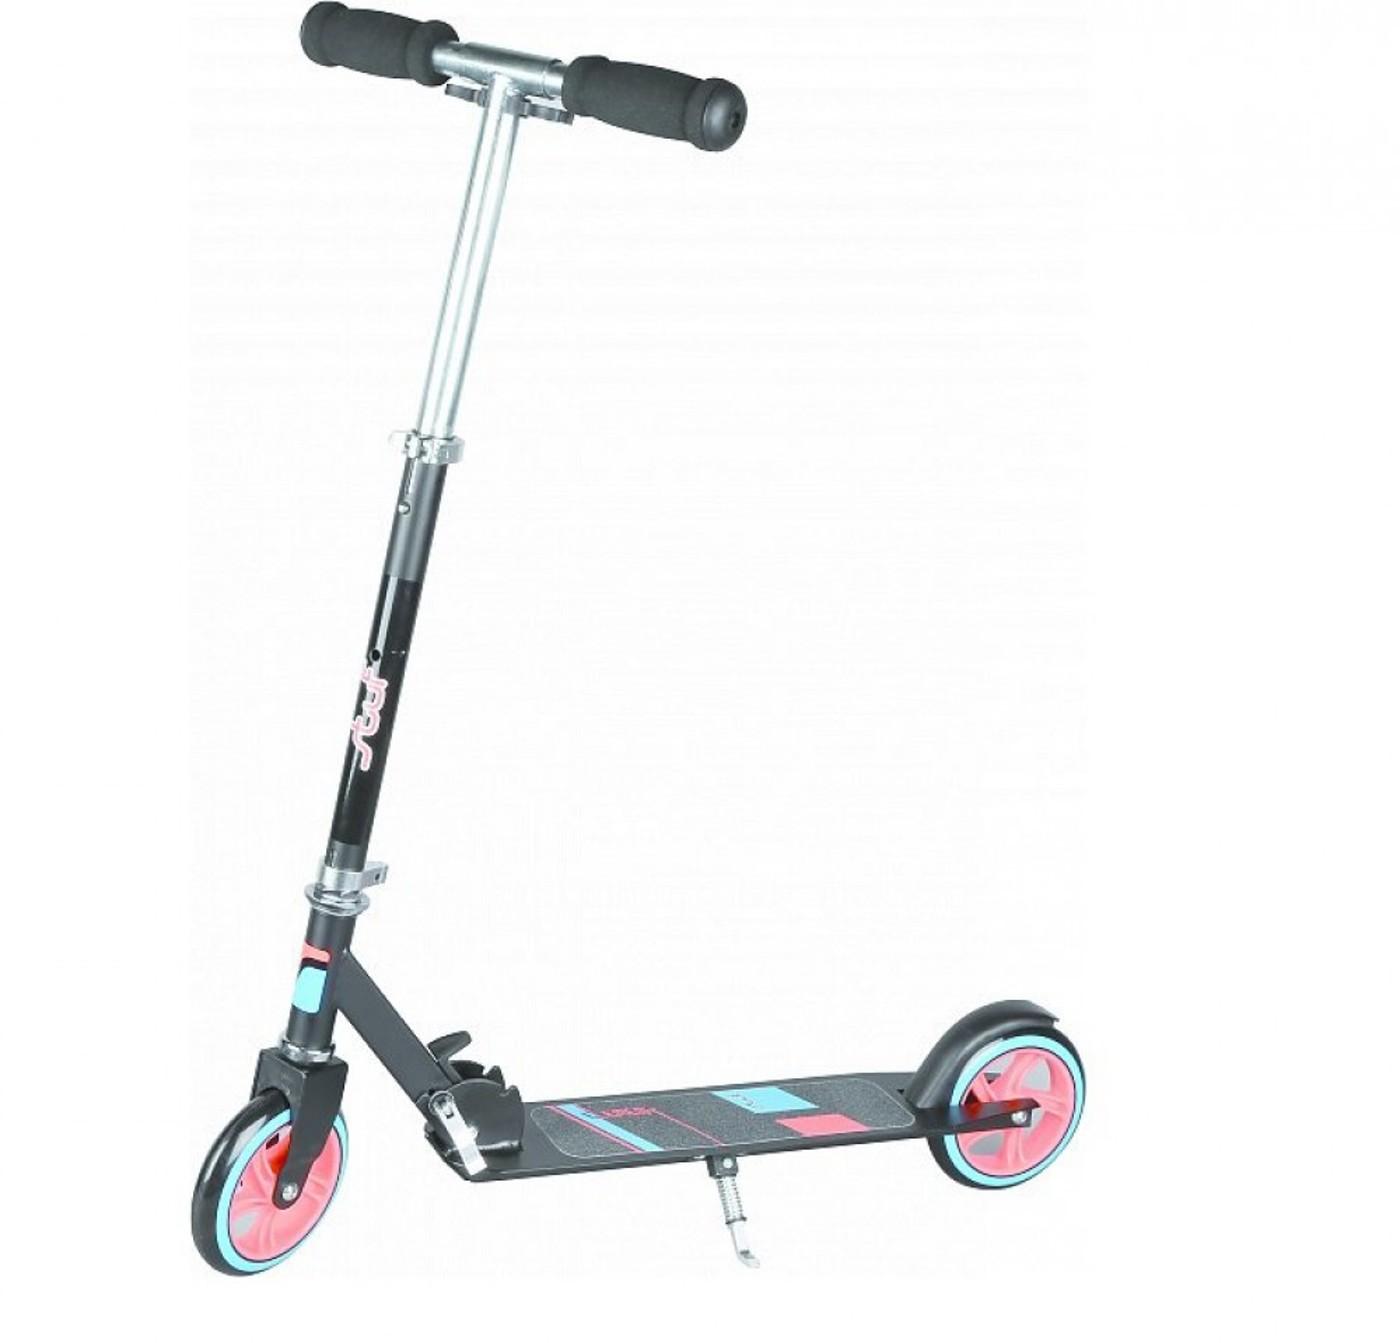 STUF Scooter URBAN